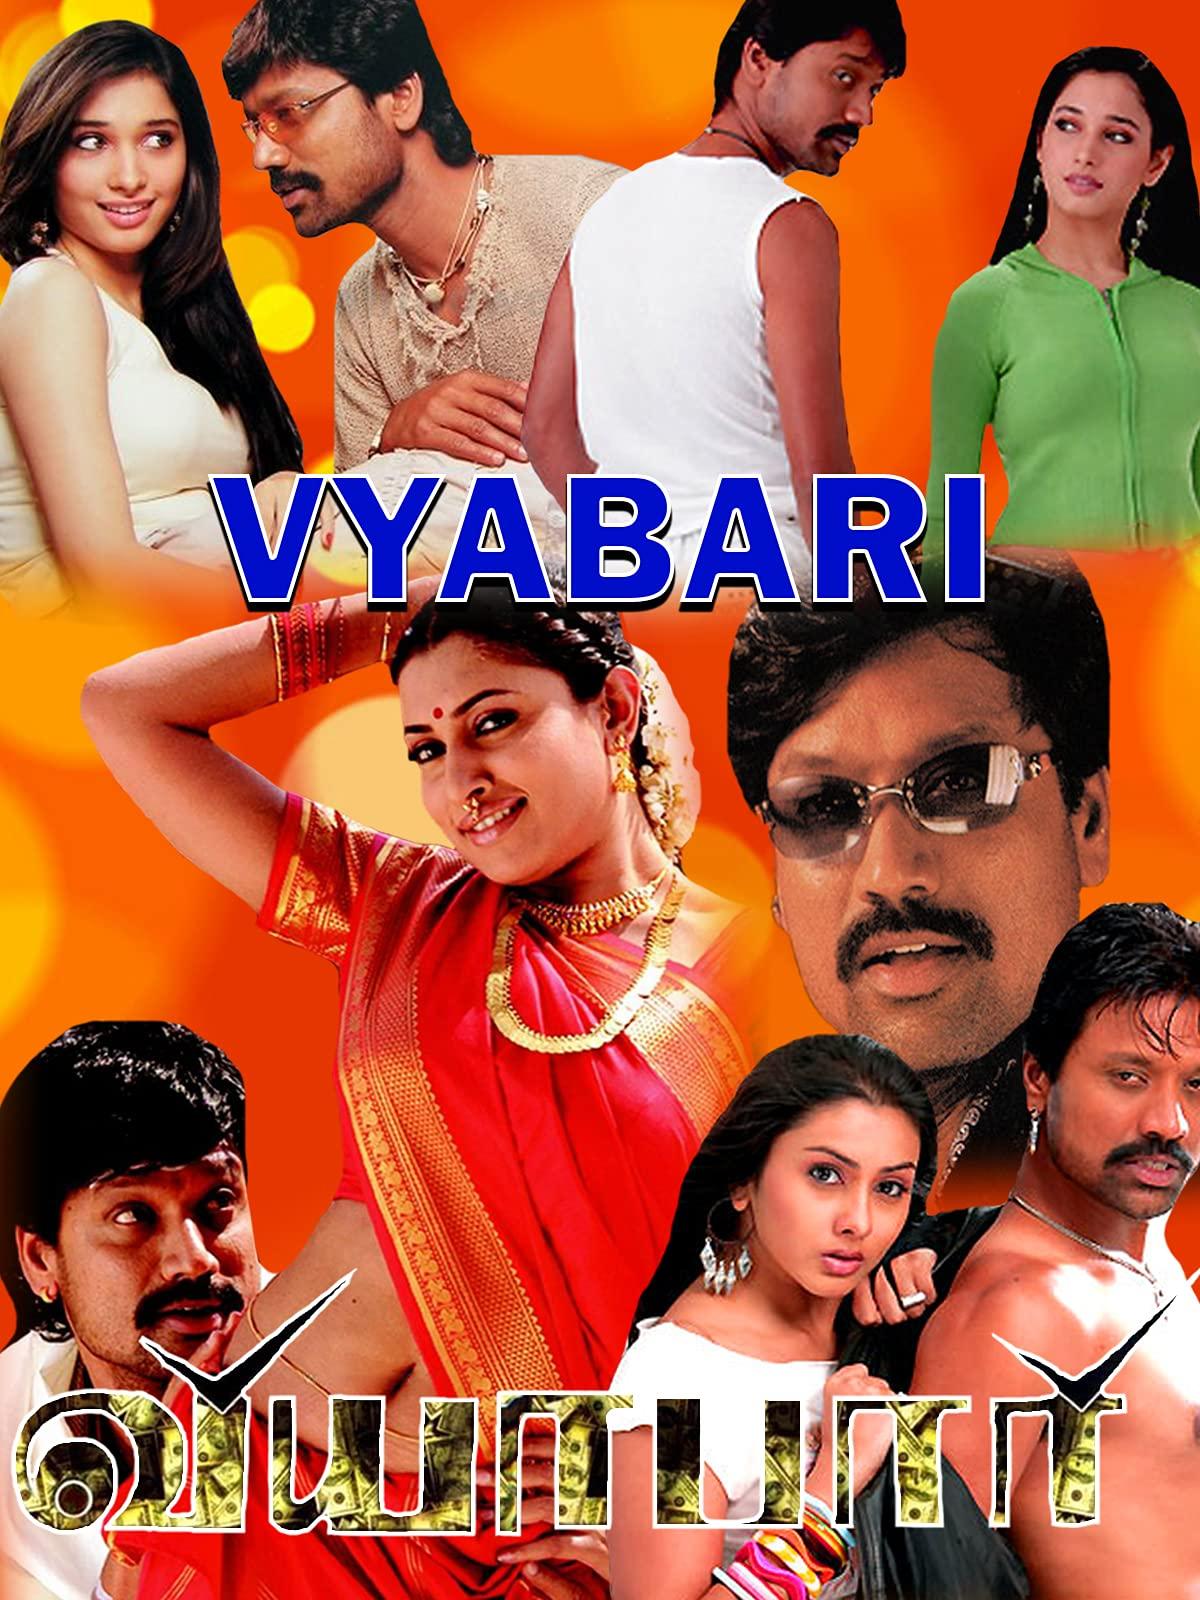 Viyabari